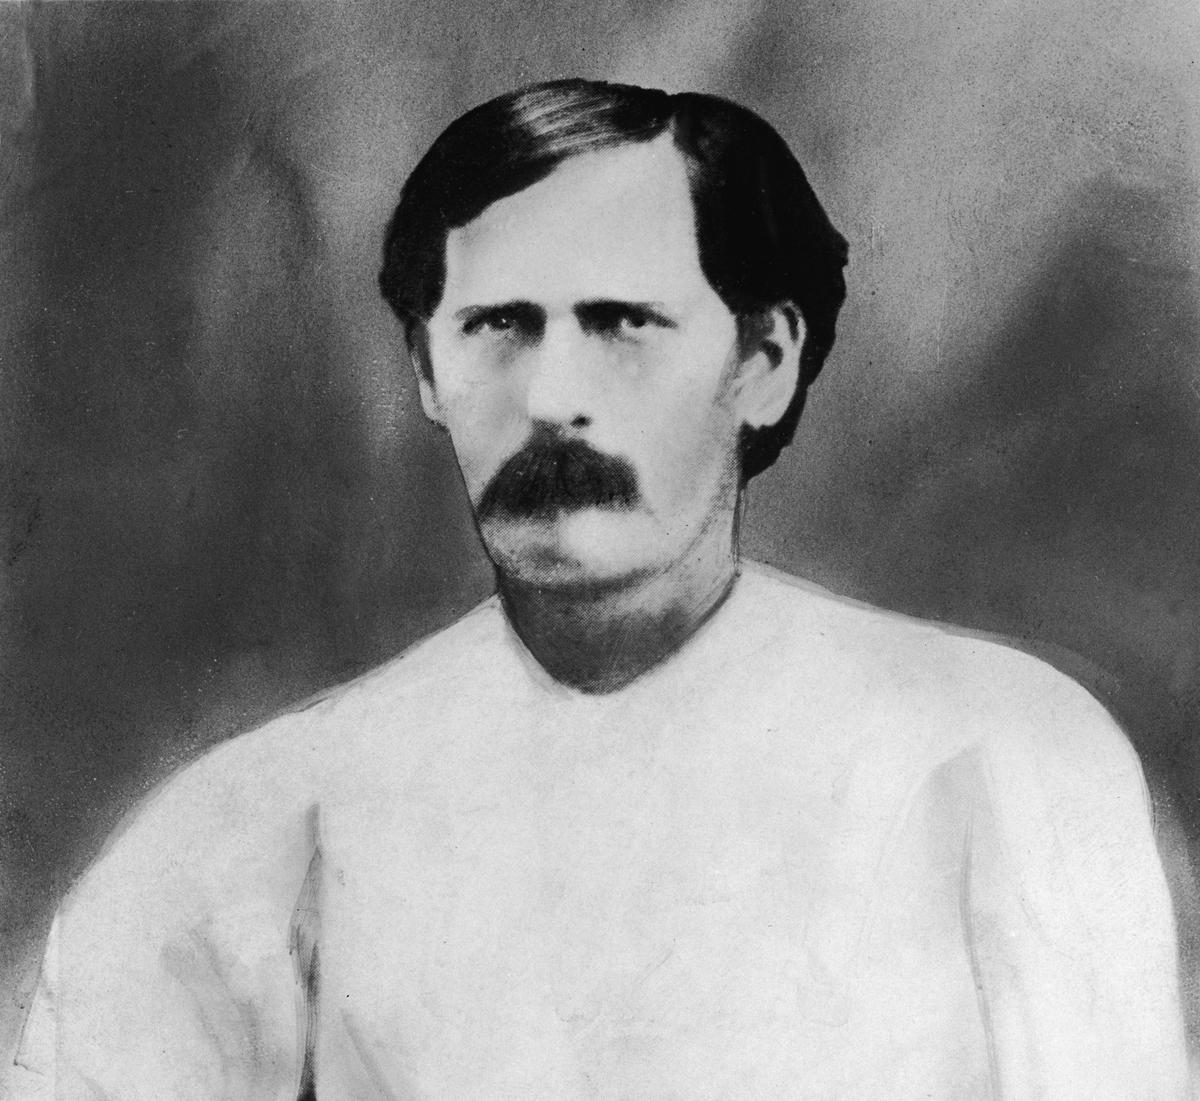 A portrait of American lawman and gun fighter Wyatt Earp, circa 1873.